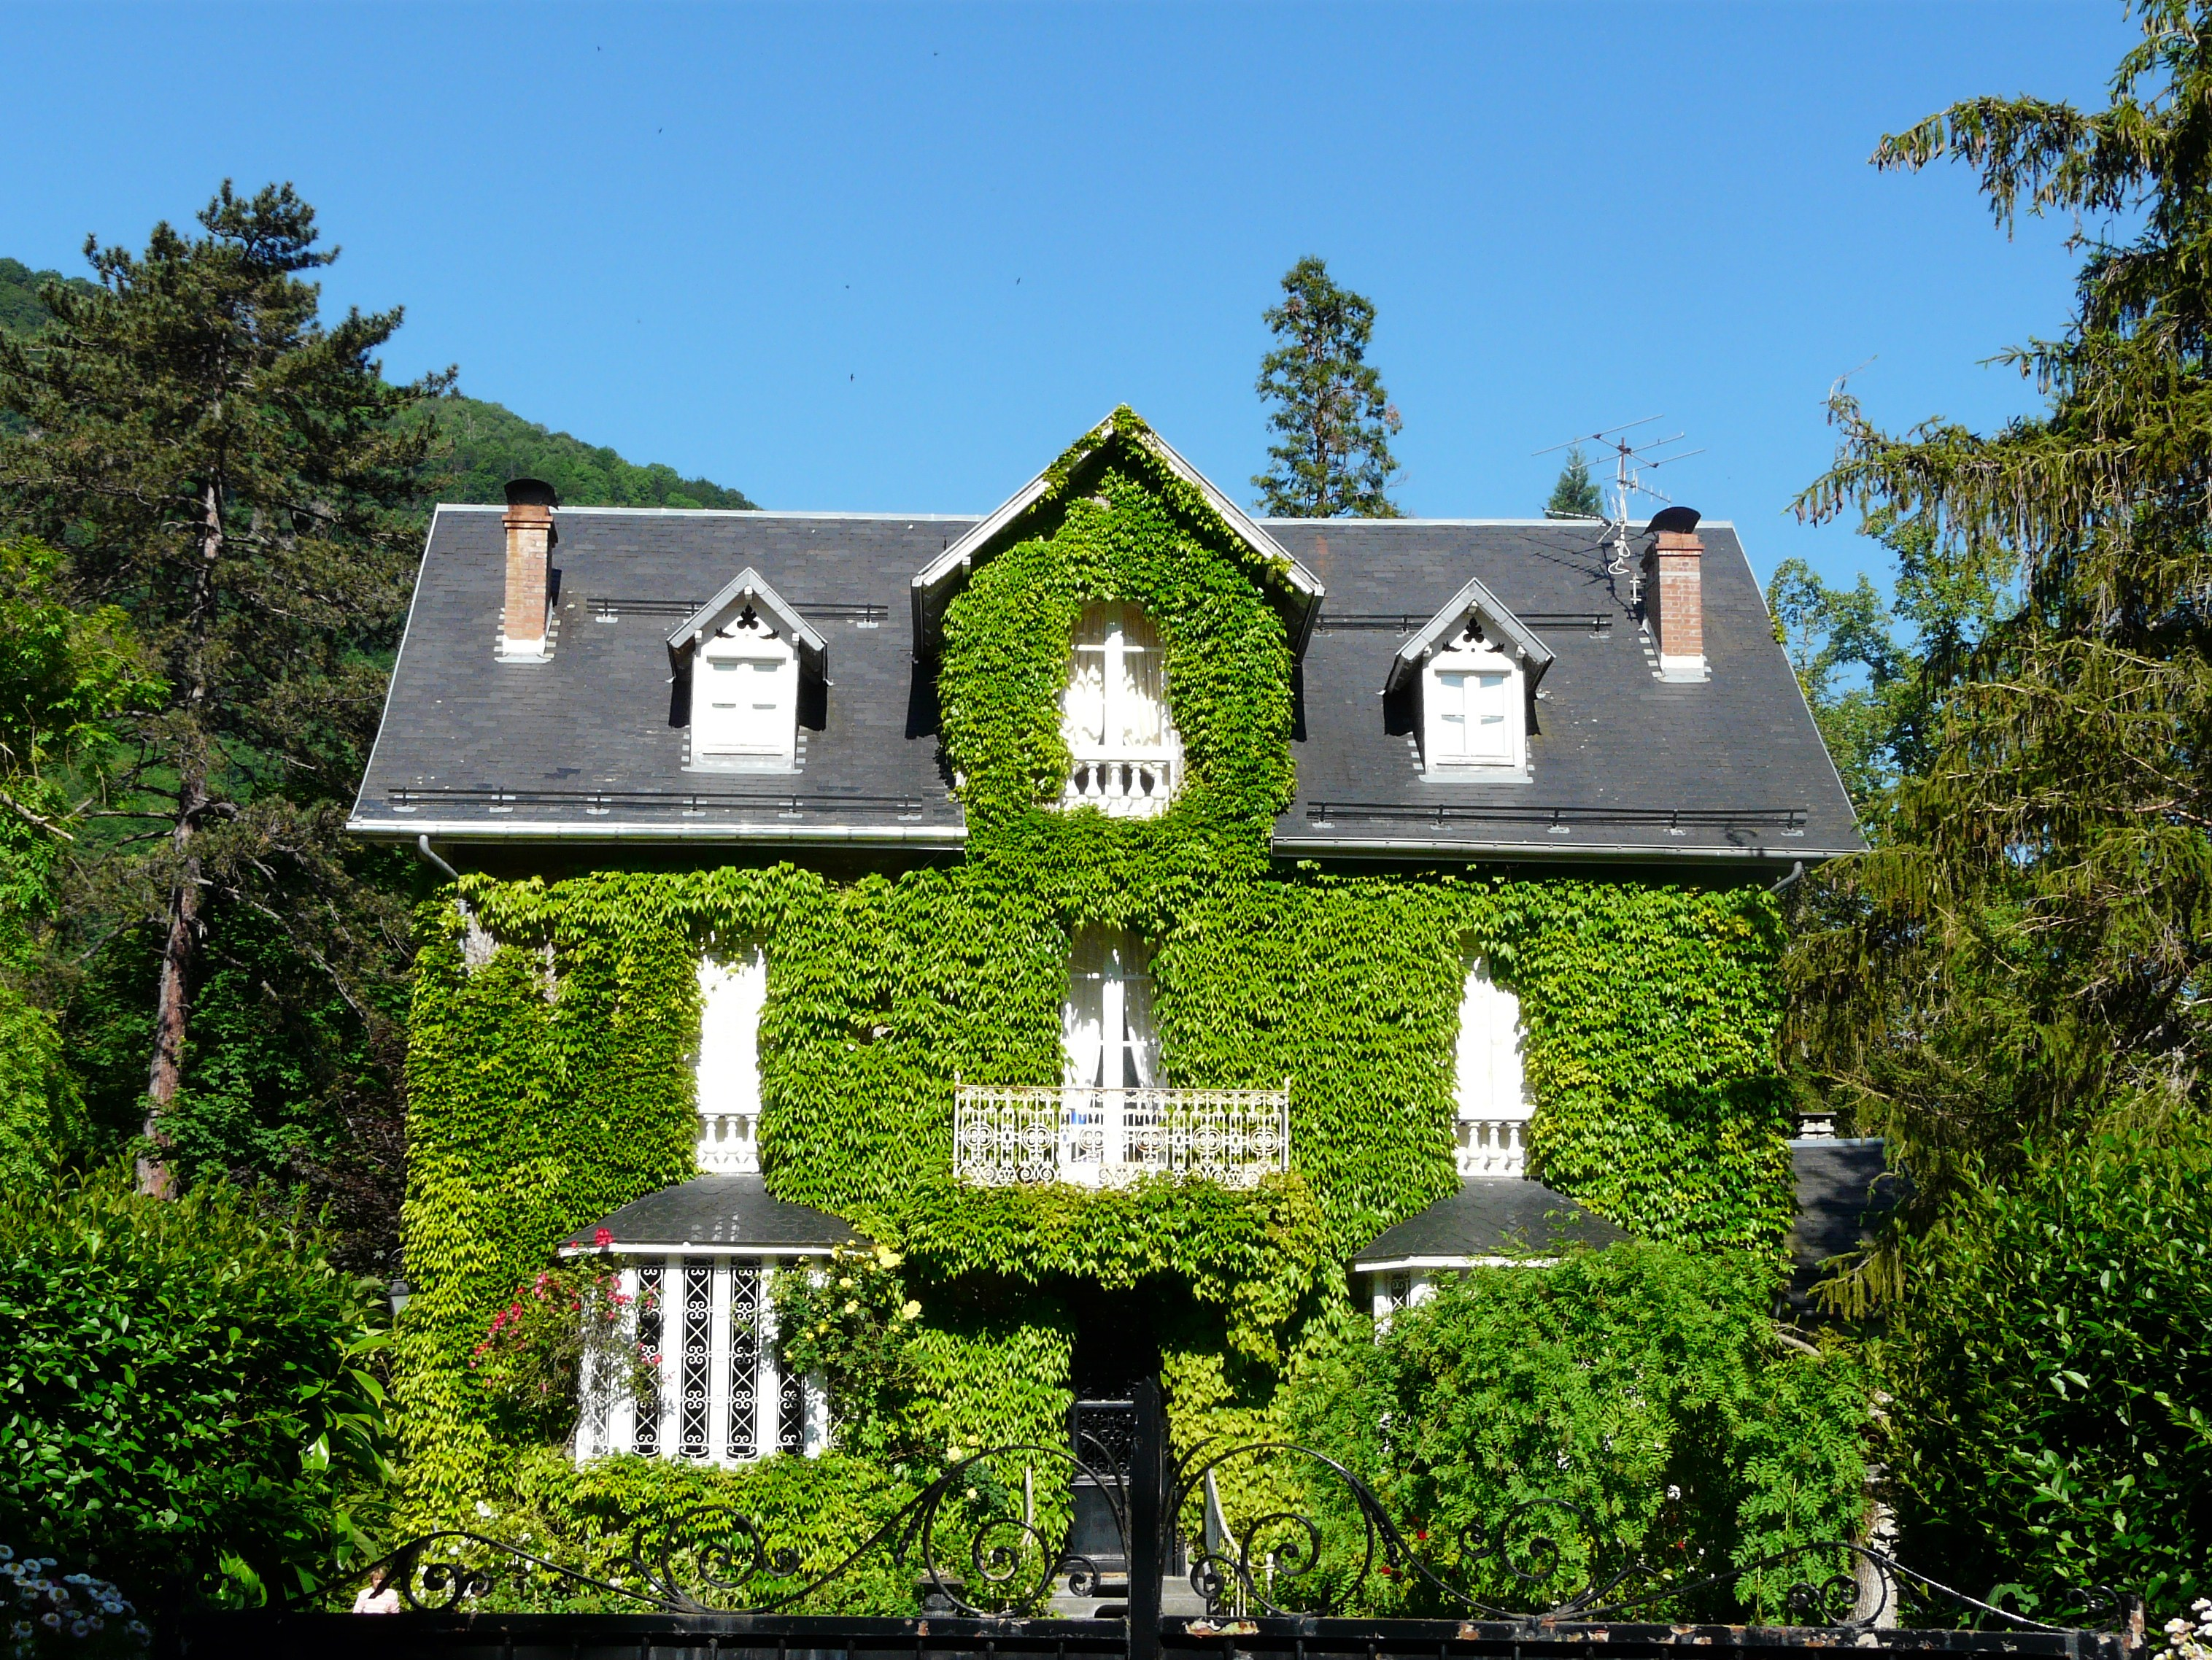 file bagn res de luchon maison verte bd gorsse jpg wikimedia commons. Black Bedroom Furniture Sets. Home Design Ideas